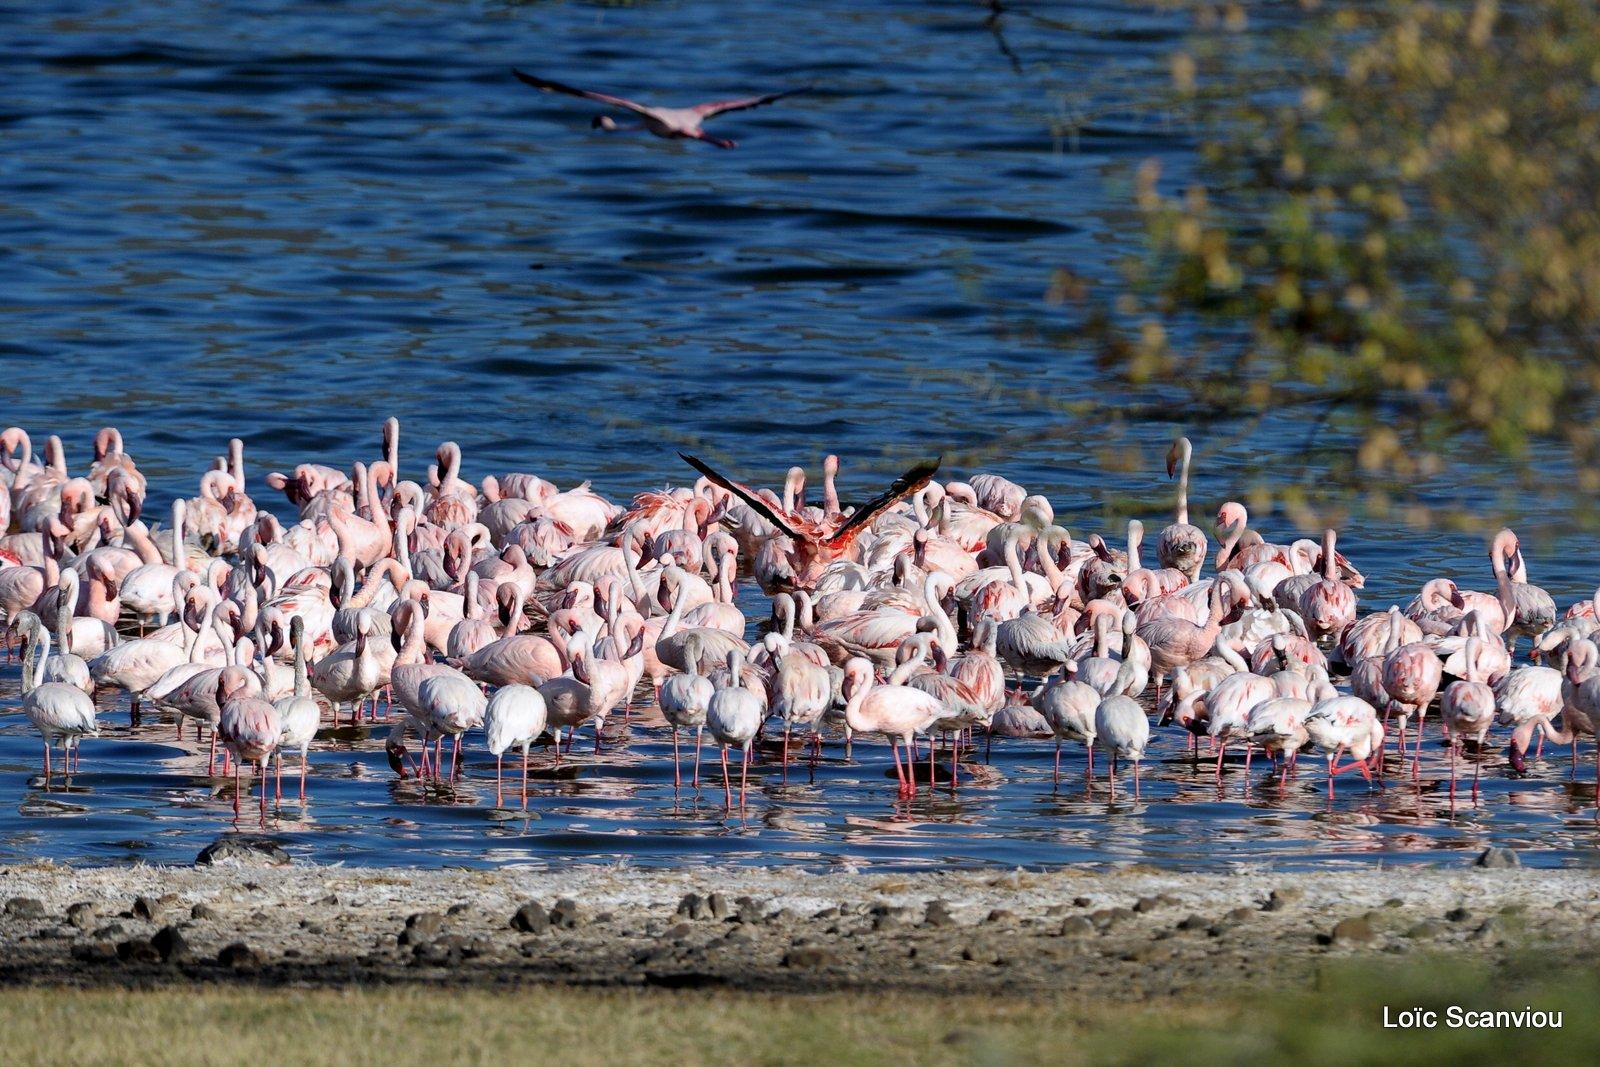 Flamants roses/Flamingoes (5)